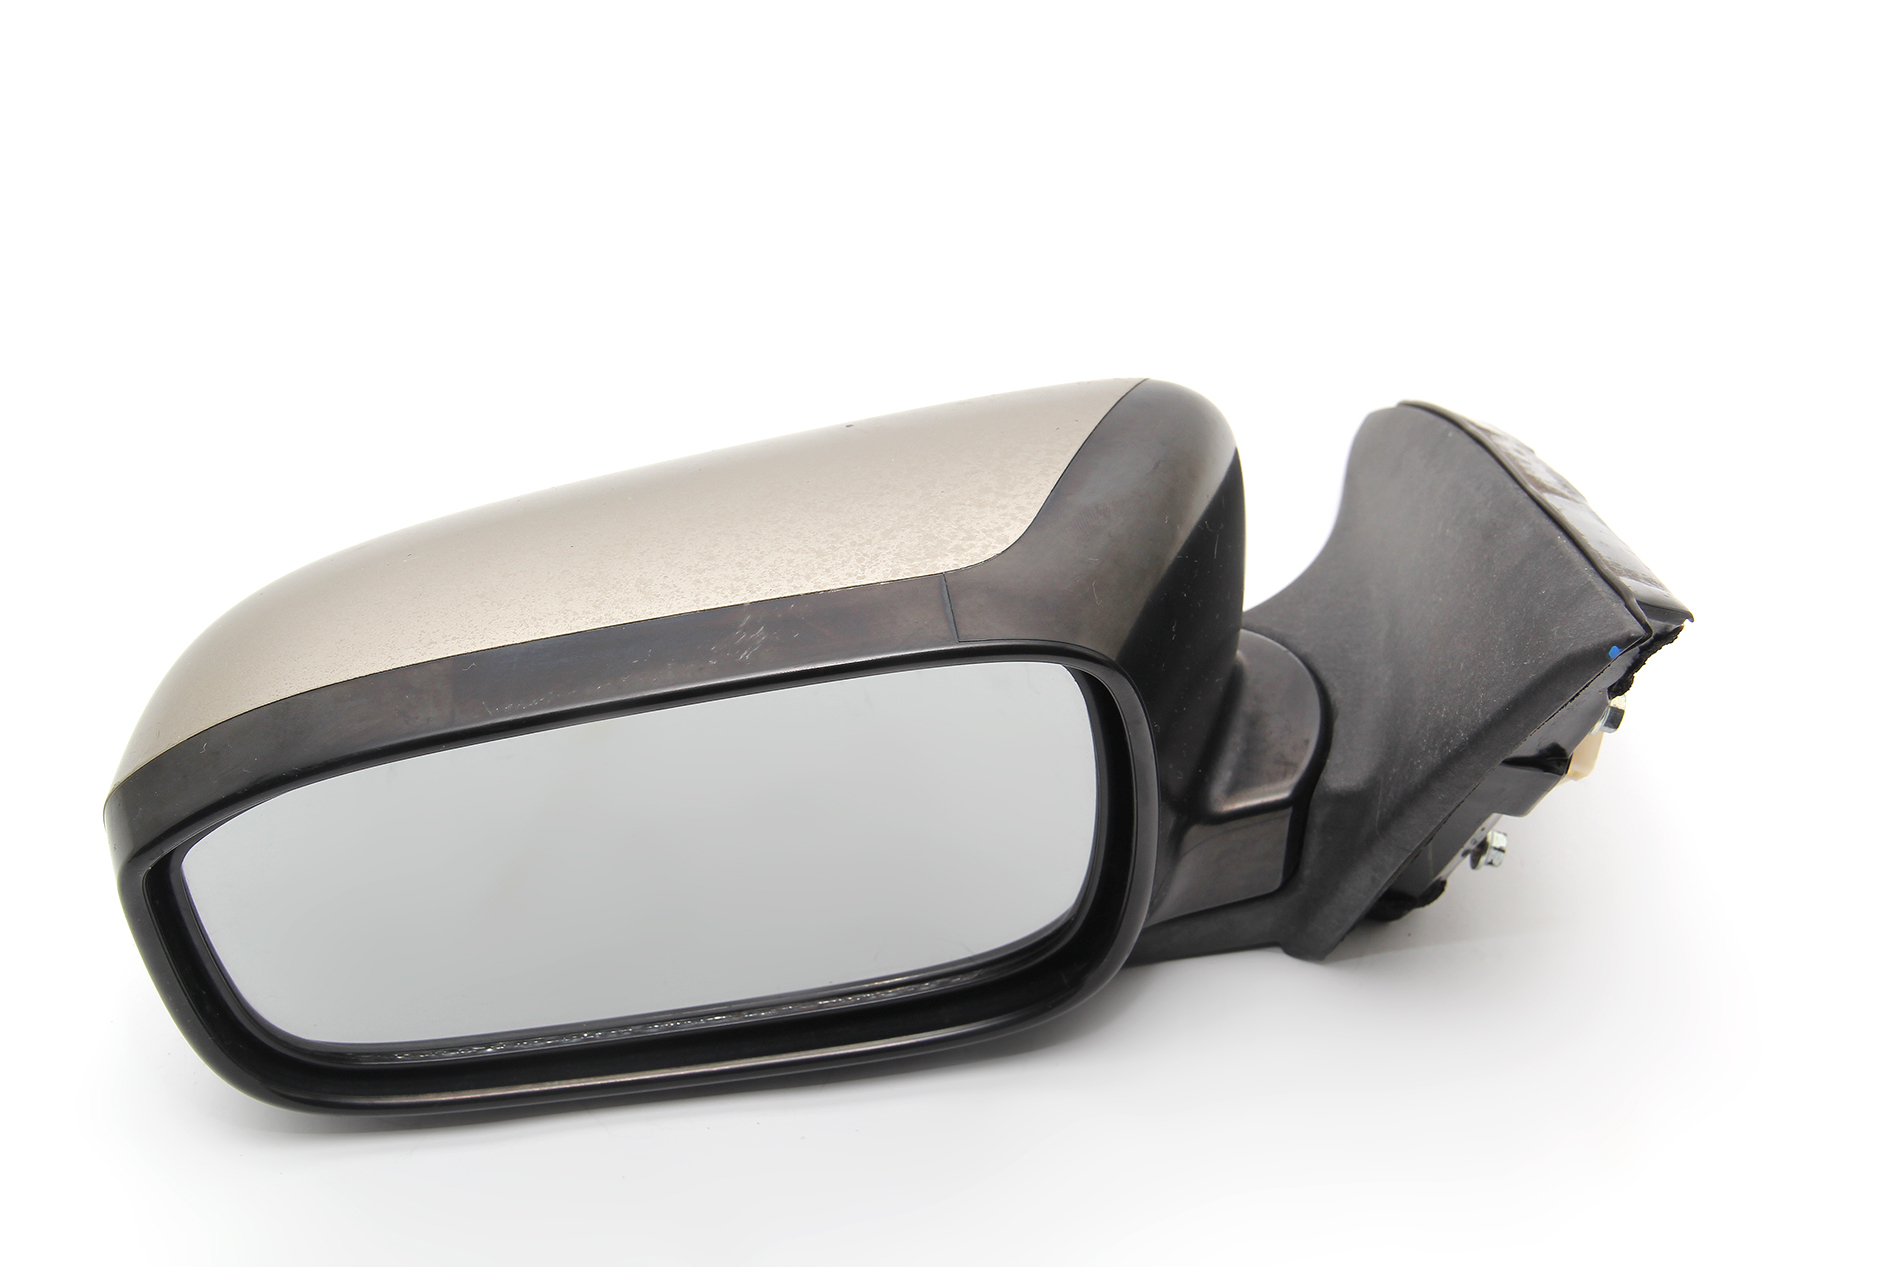 New Drivers Power Side Mirror Heated Gray Cover for 03-07 Honda Accord Sedan